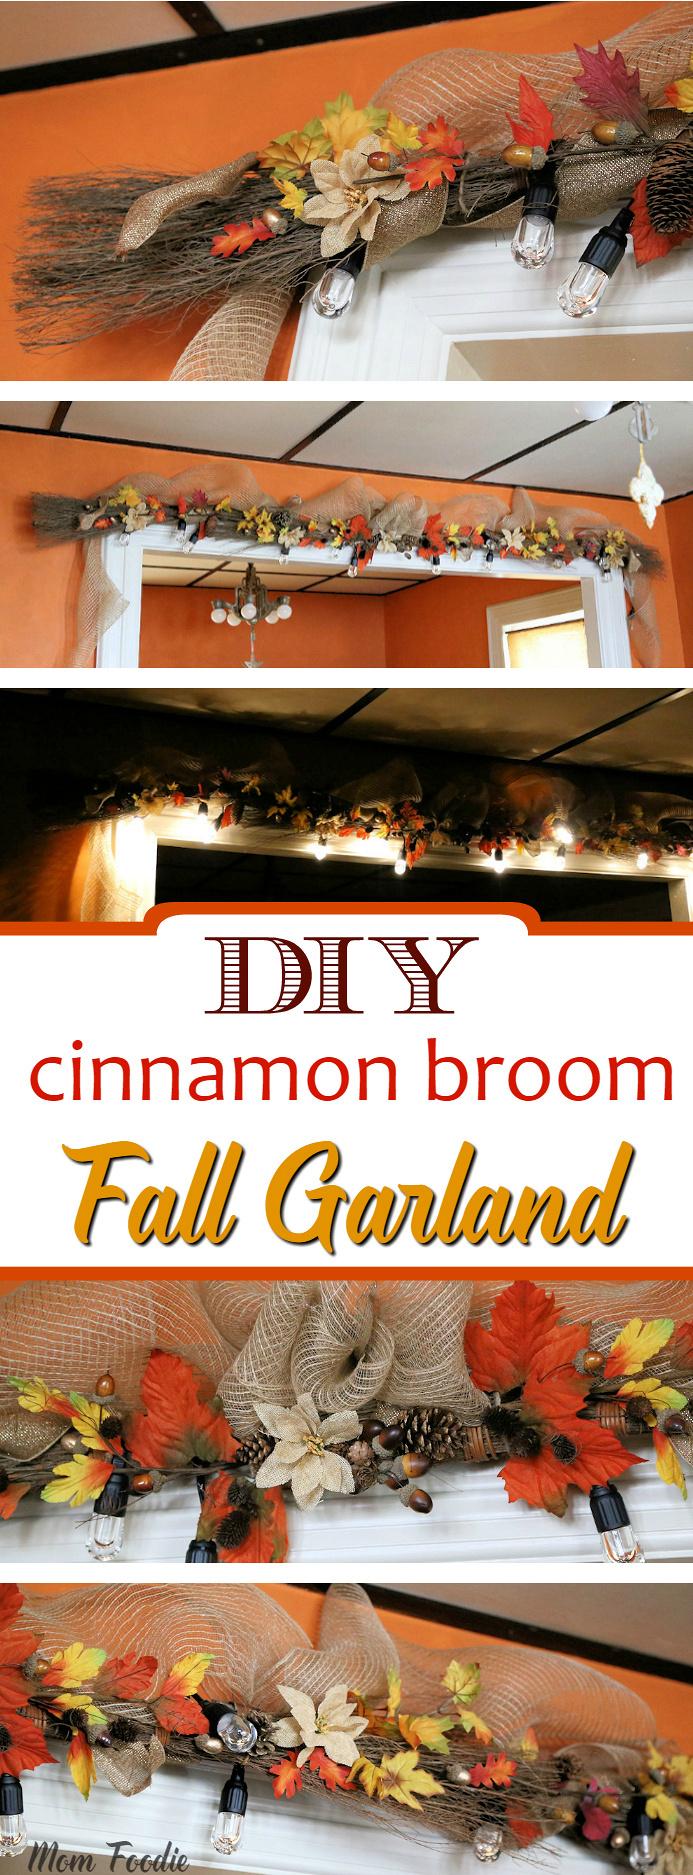 DIY Cinnamon Broom Fall Garland with Cafe Lights